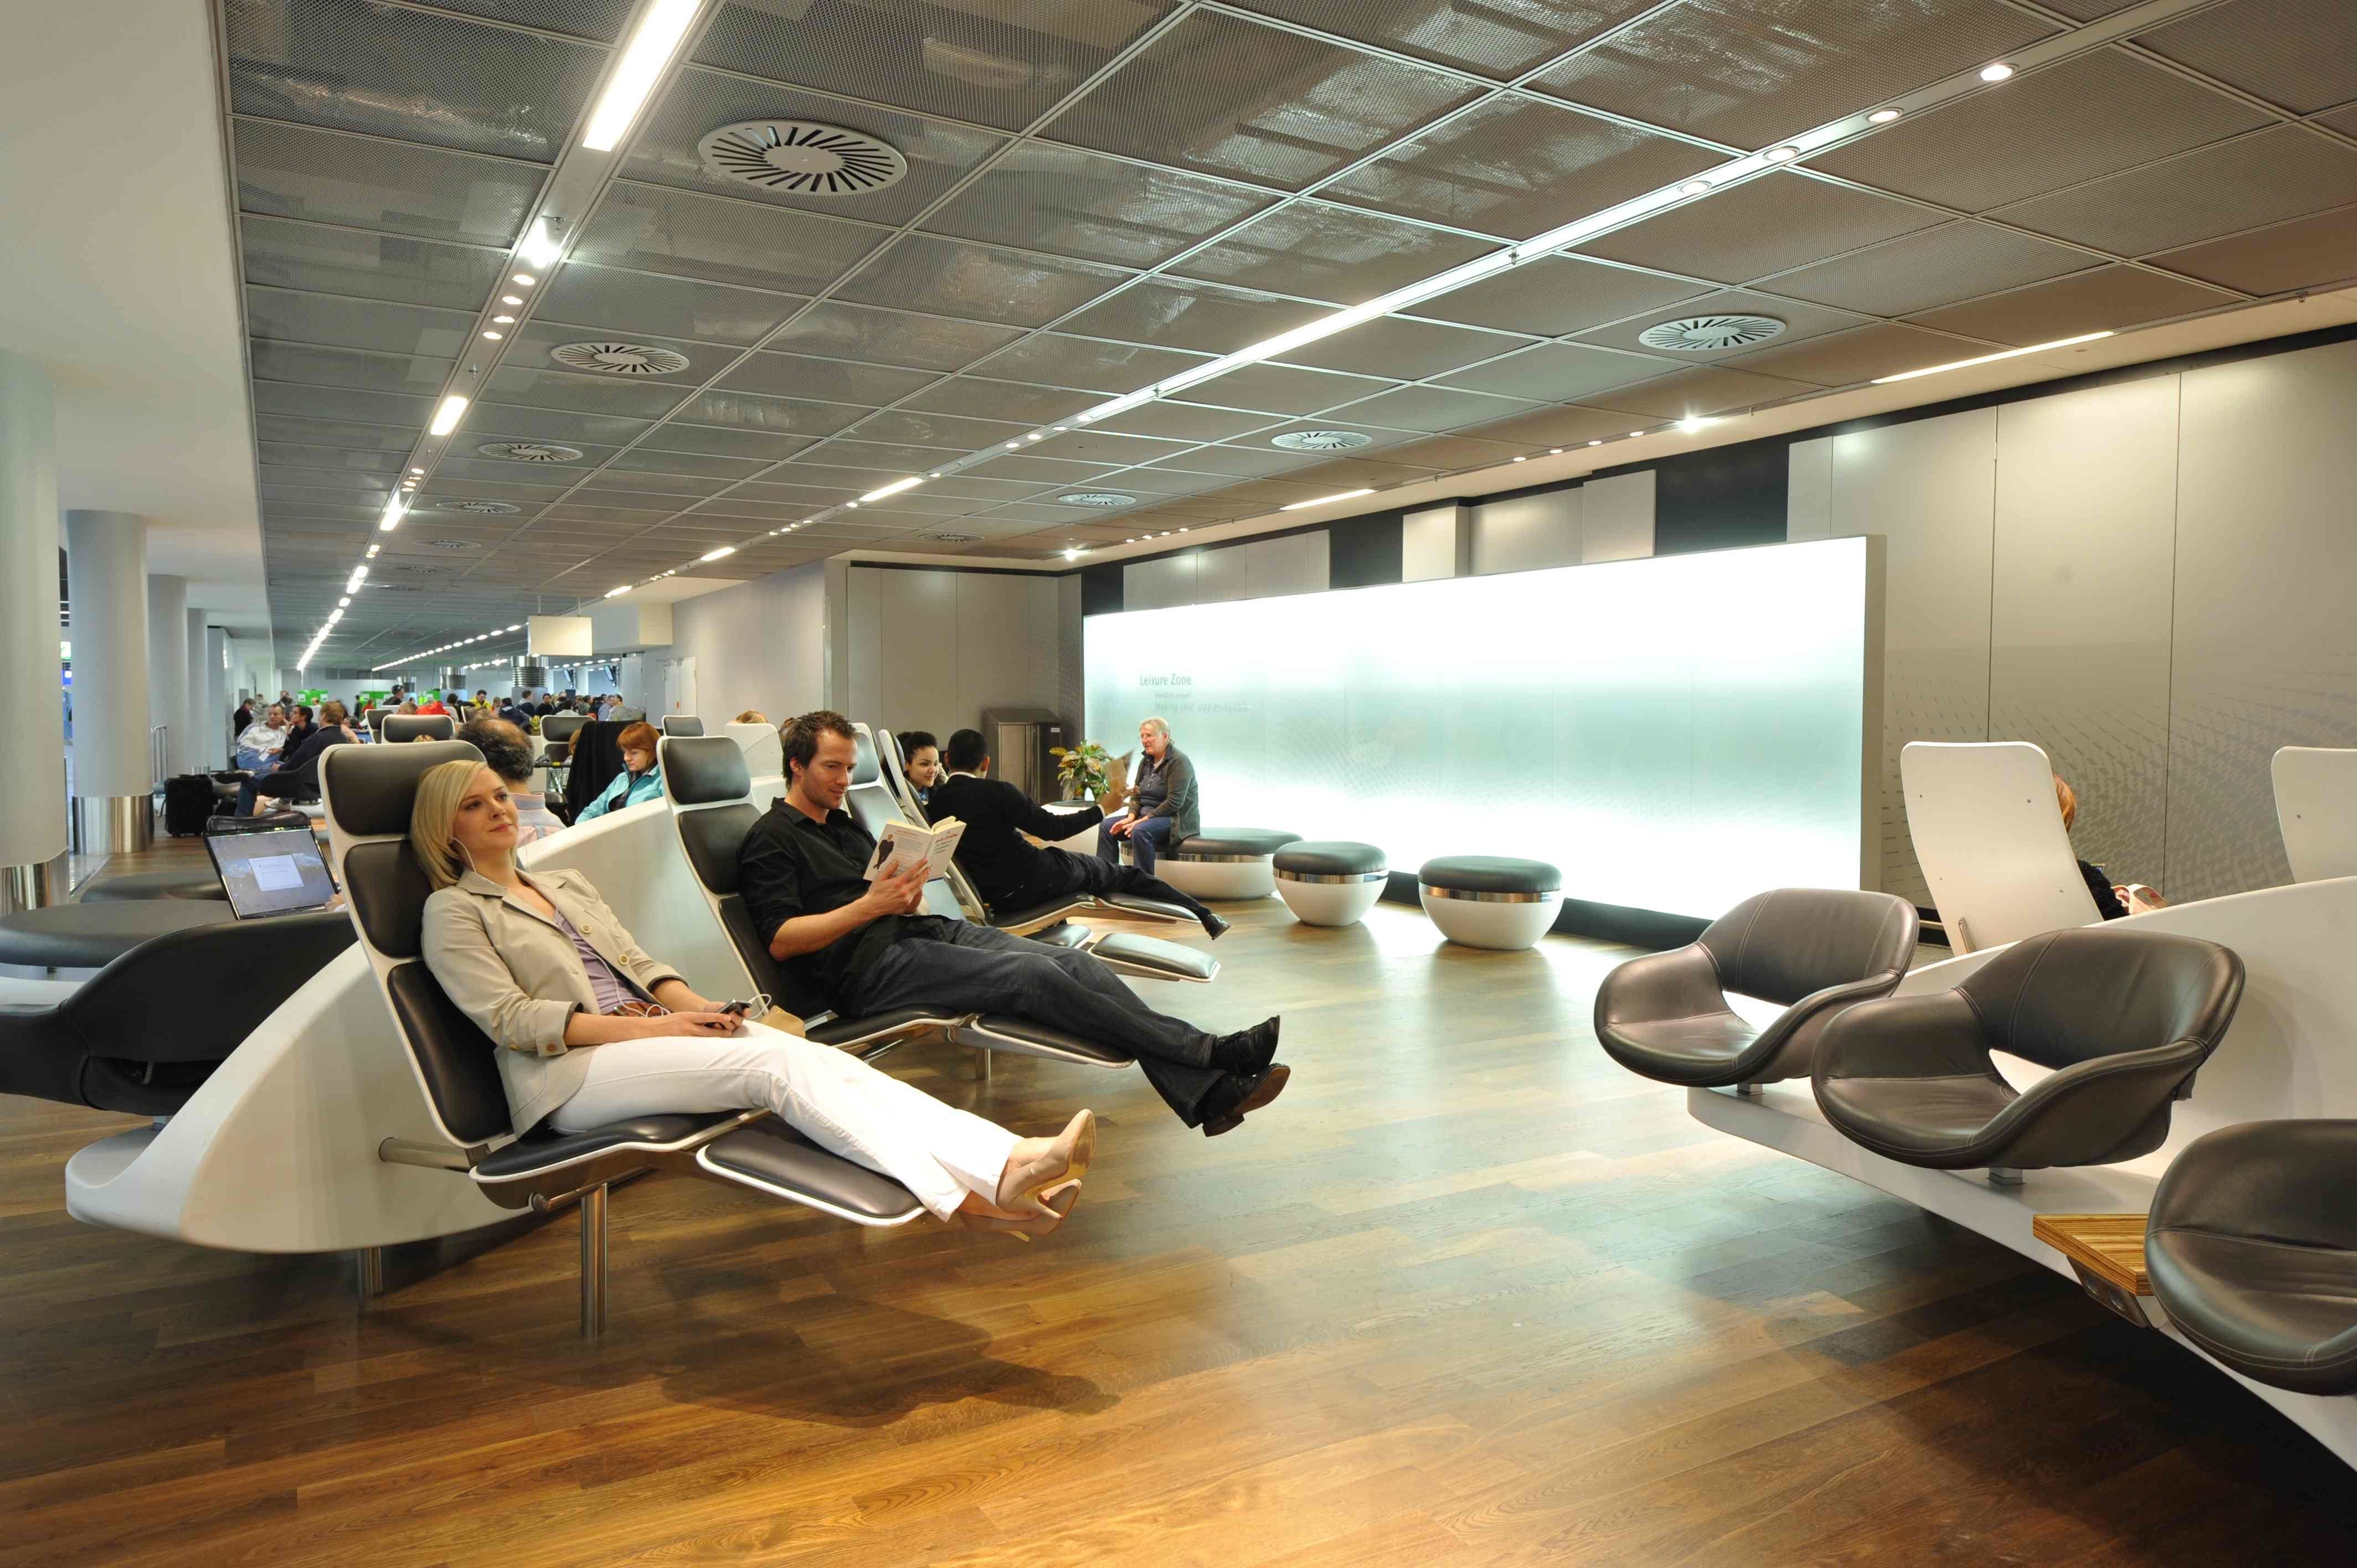 frankfurt airport lounge cerca con google sit sofa pinterest airport lounge recliner. Black Bedroom Furniture Sets. Home Design Ideas